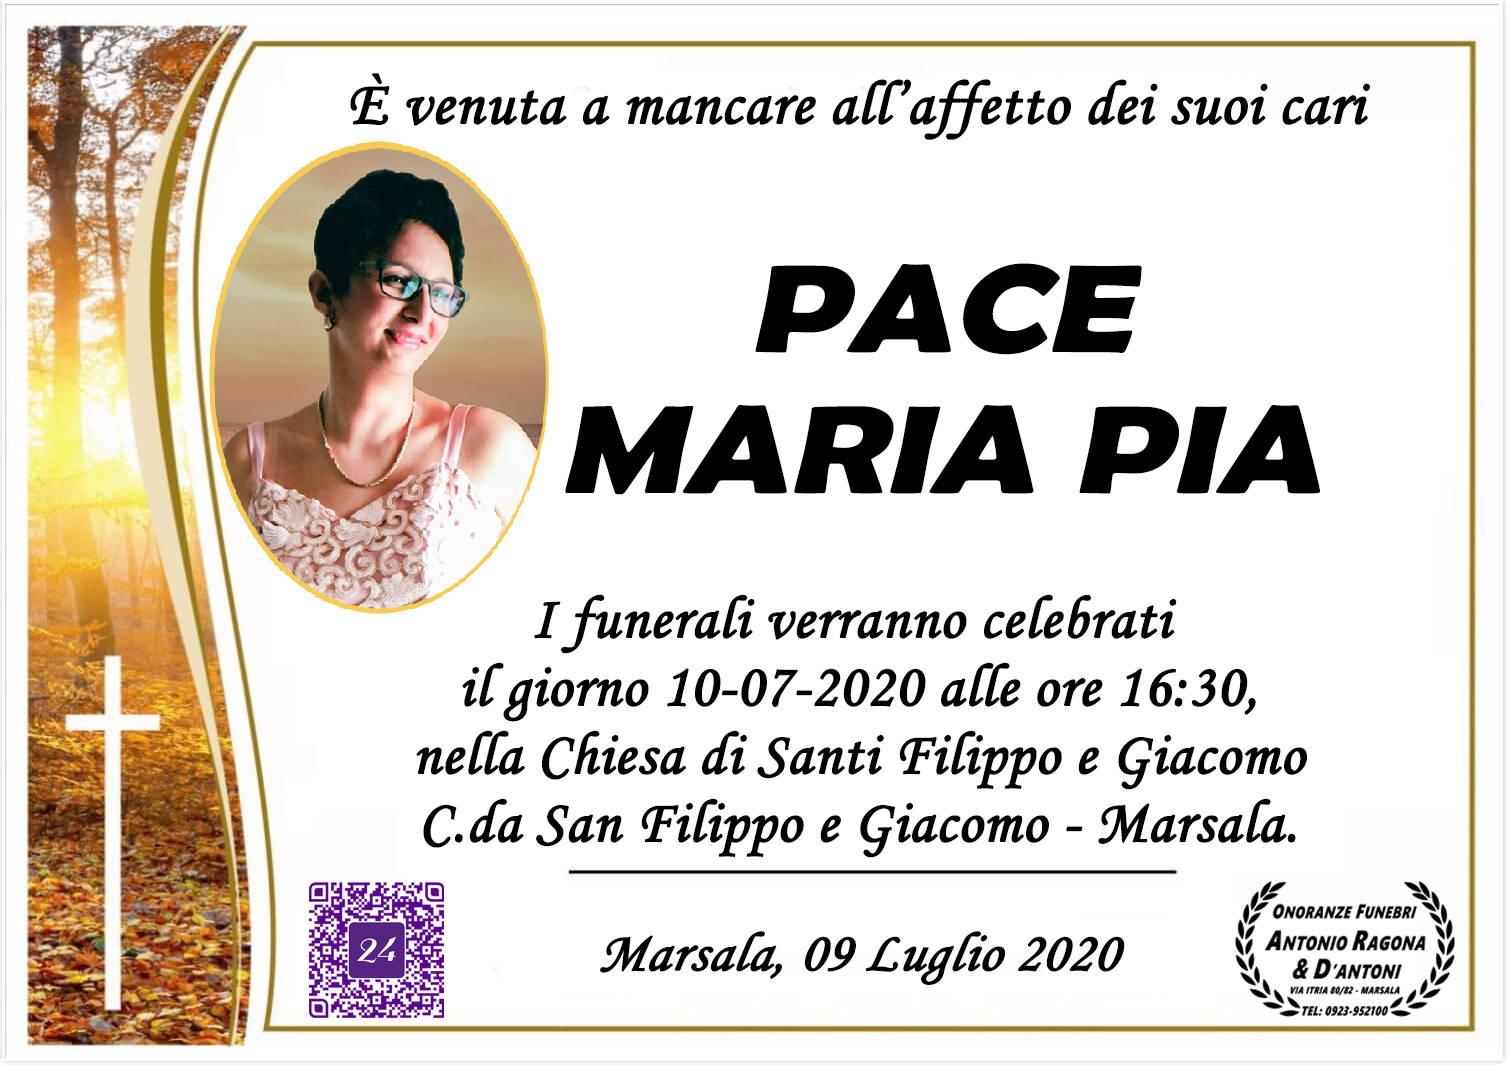 Maria Pia Pace